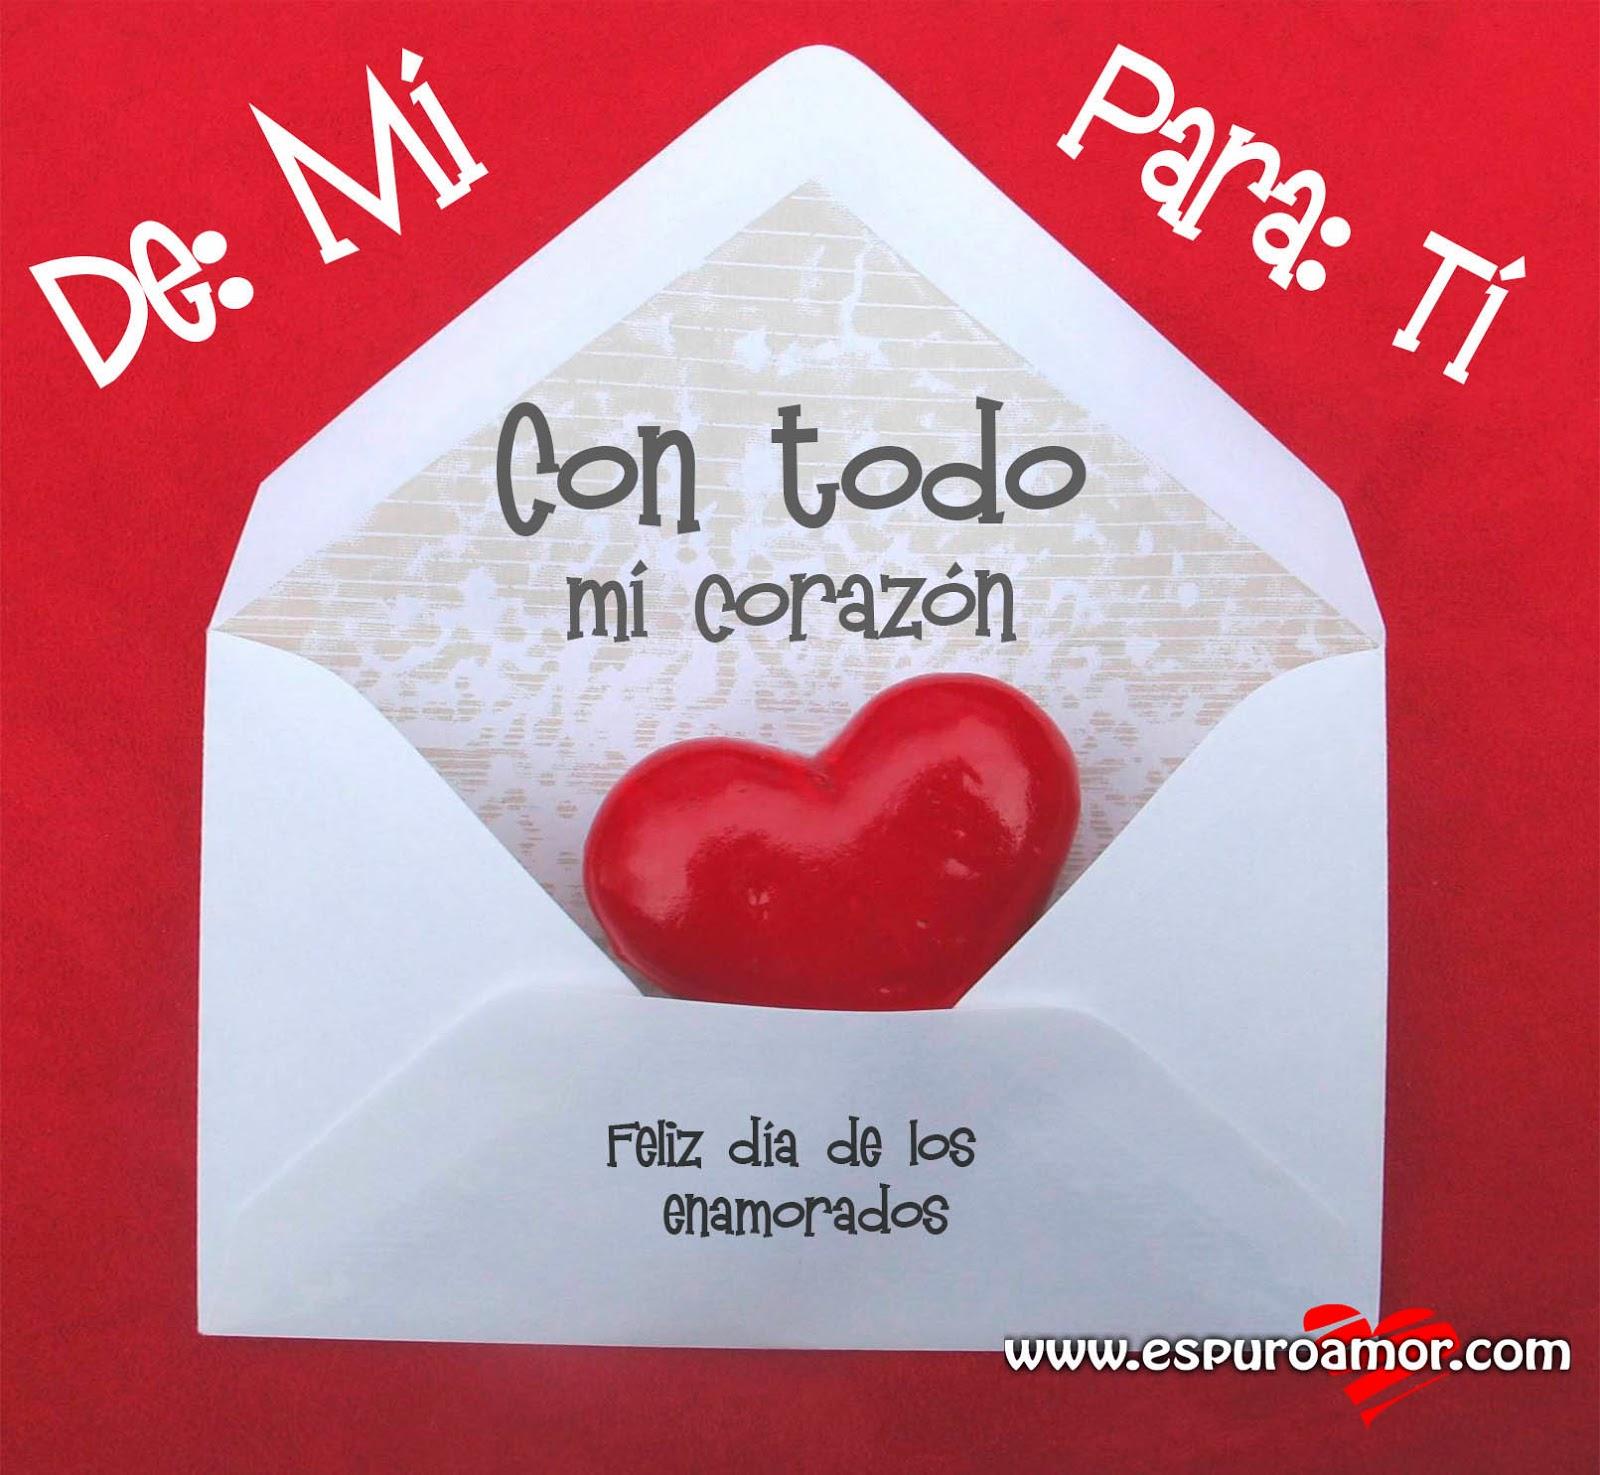 Imagenes con frases para San Valentin. Dia de los  - Imagenes Para El Dia De San Valentin Con Frases